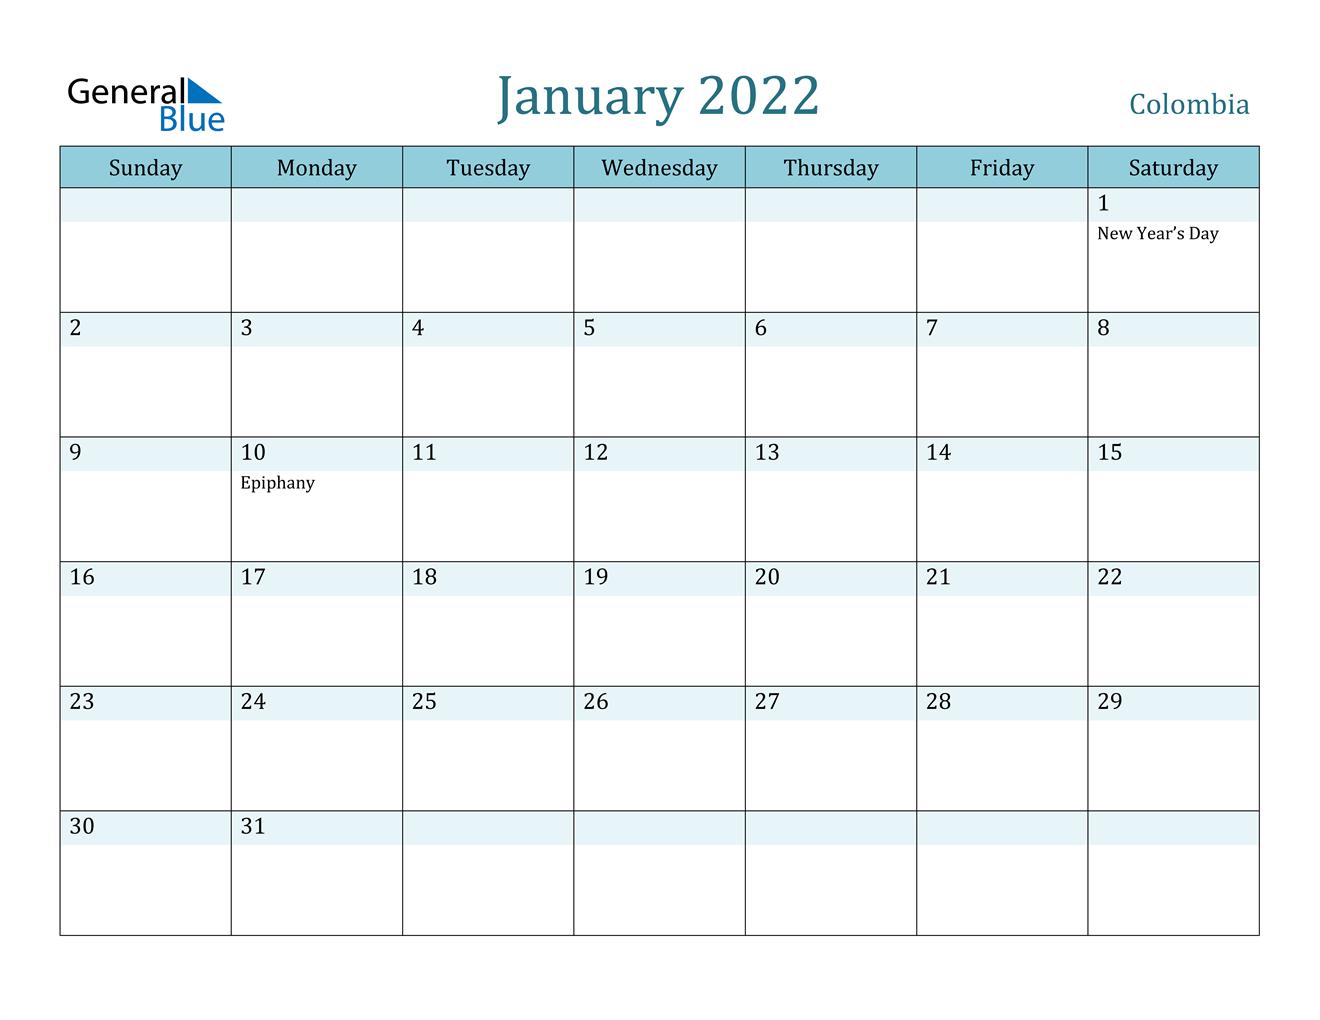 January 2022 Calendar - Colombia For January 2022 Calendar Template